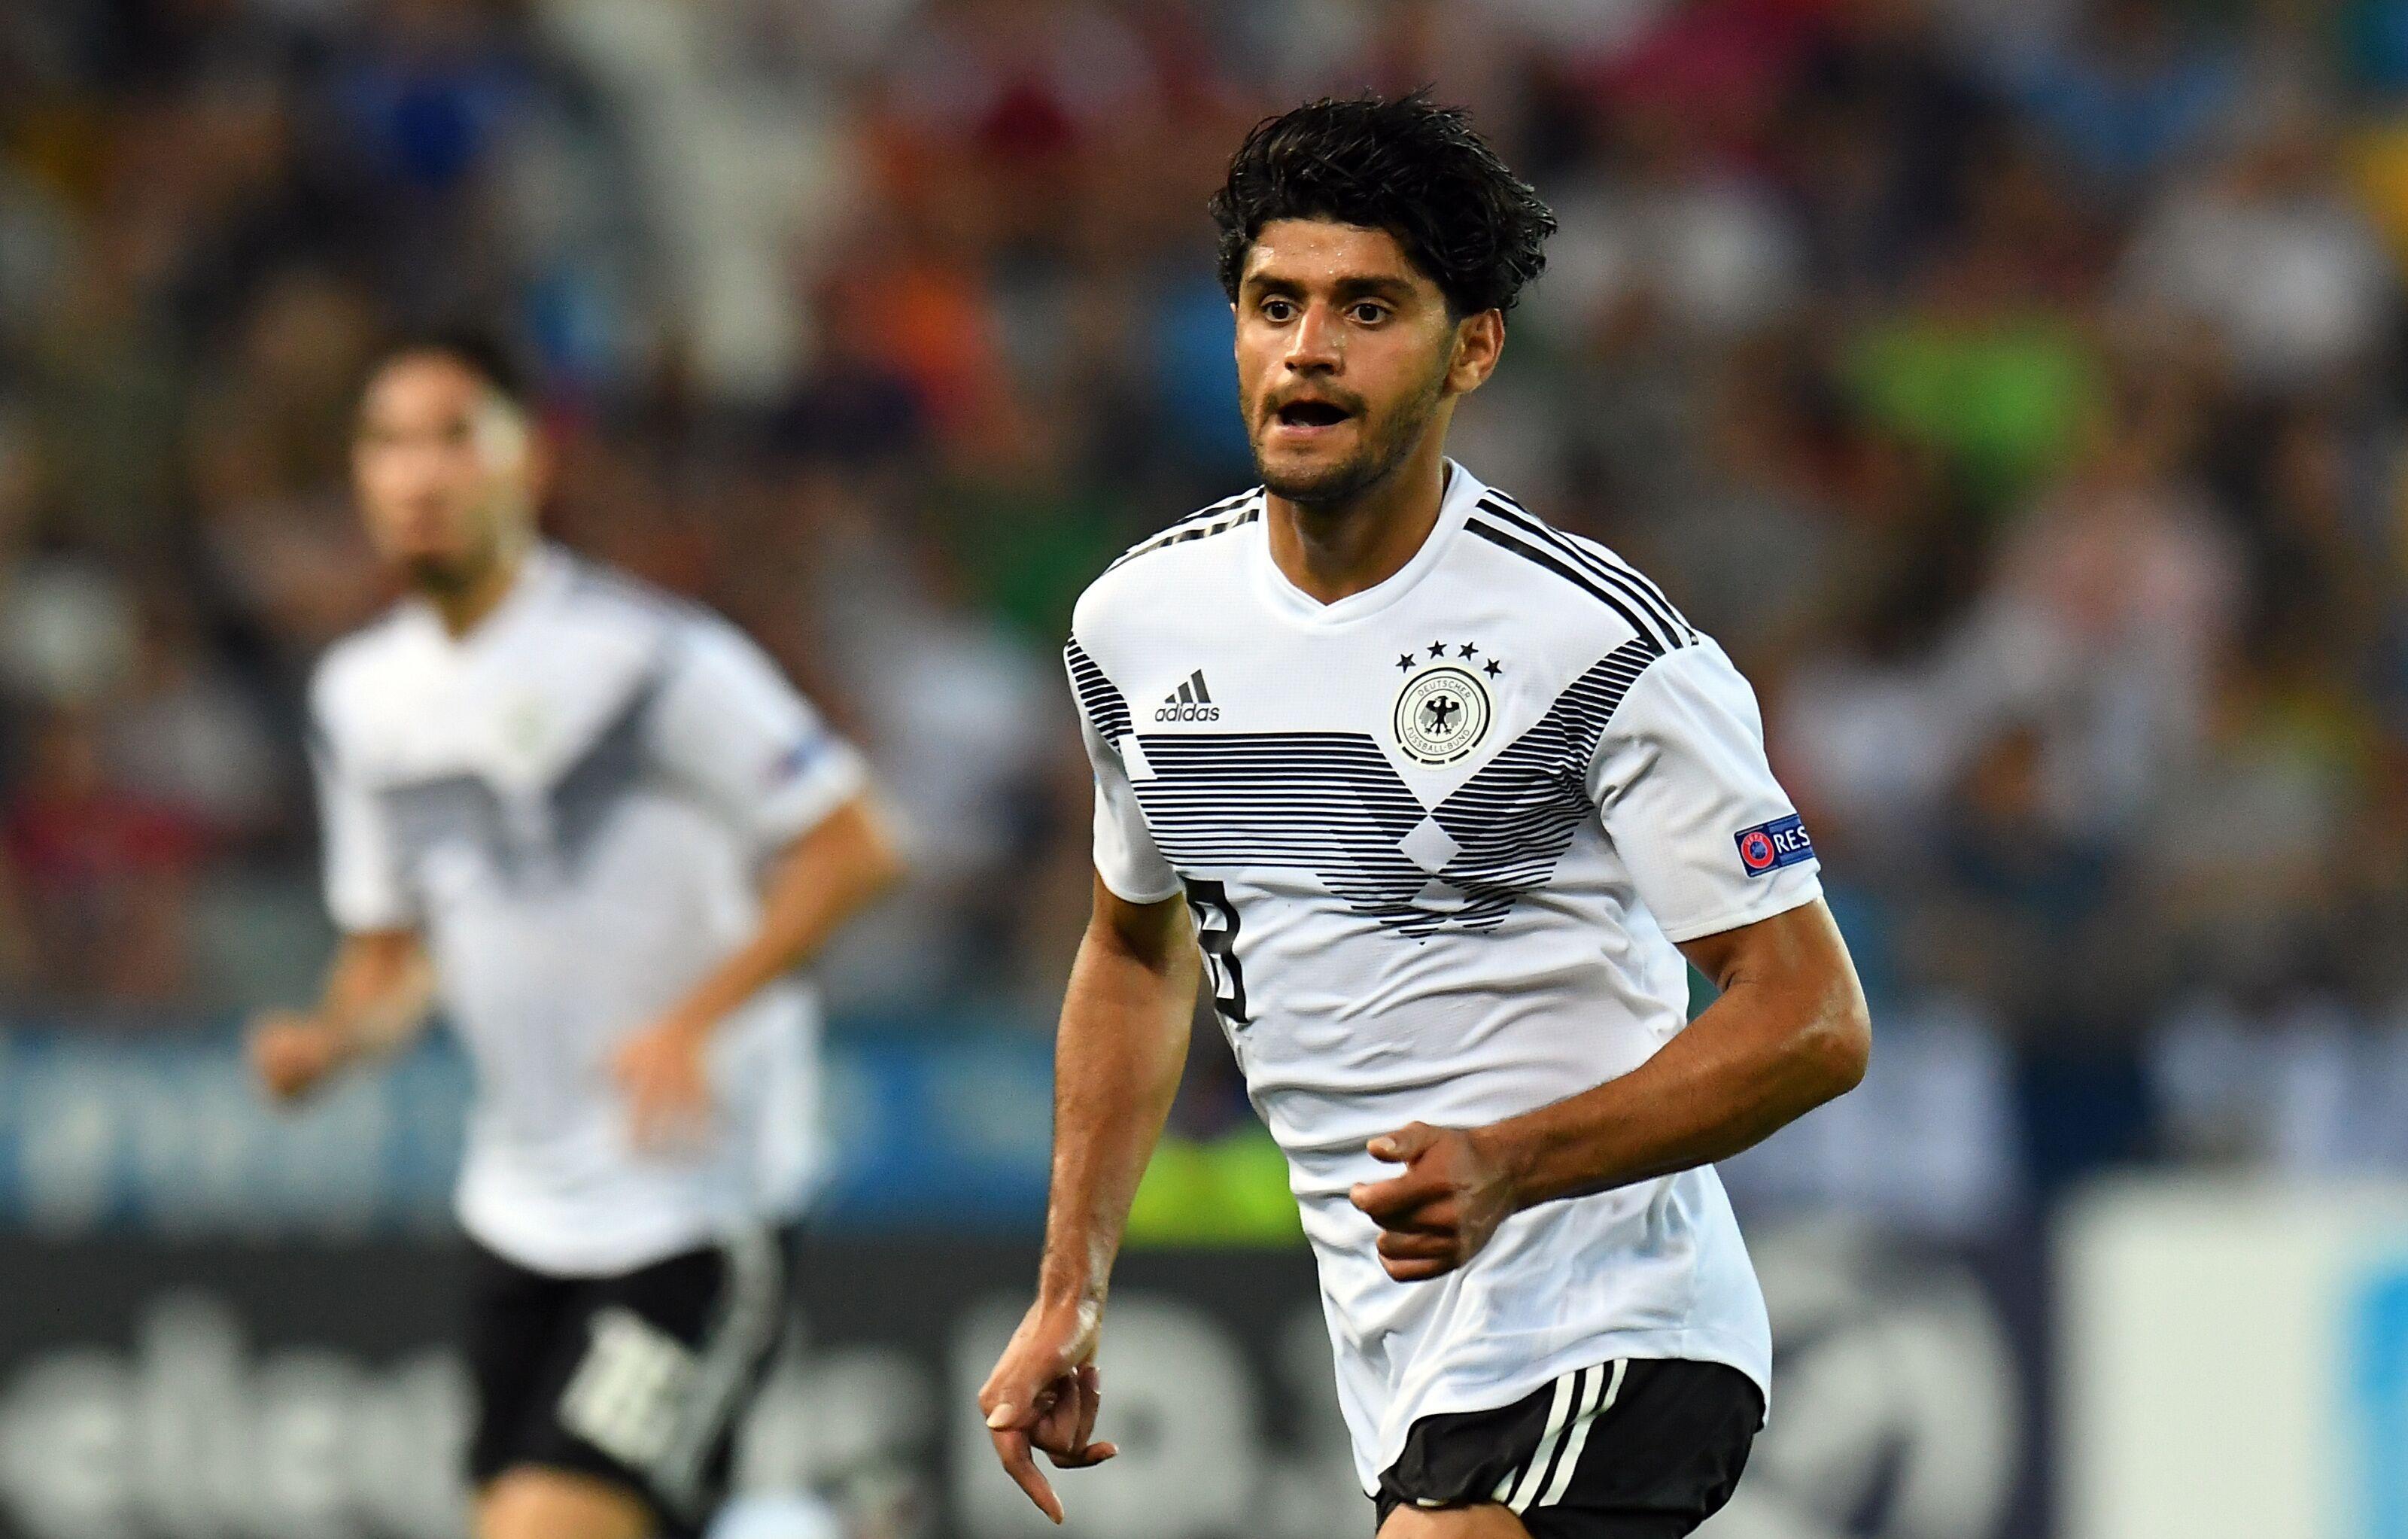 Borussia Dortmund international roundup: Dahoud reaches semifinals, Bruun Larsen knocked out of U21 Euros